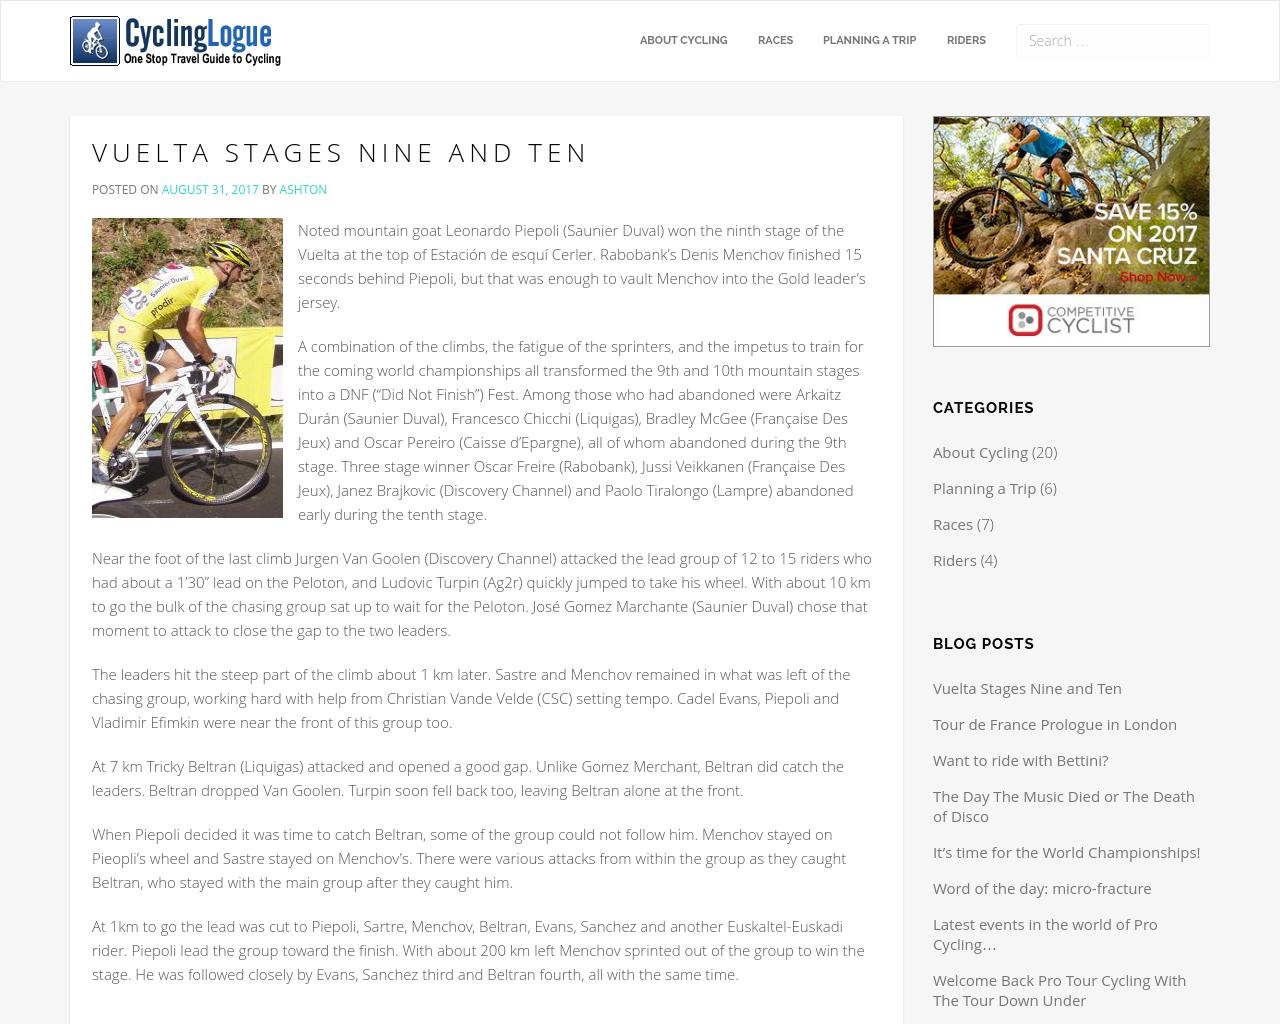 Cycling-Logue-Advertising-Reviews-Pricing